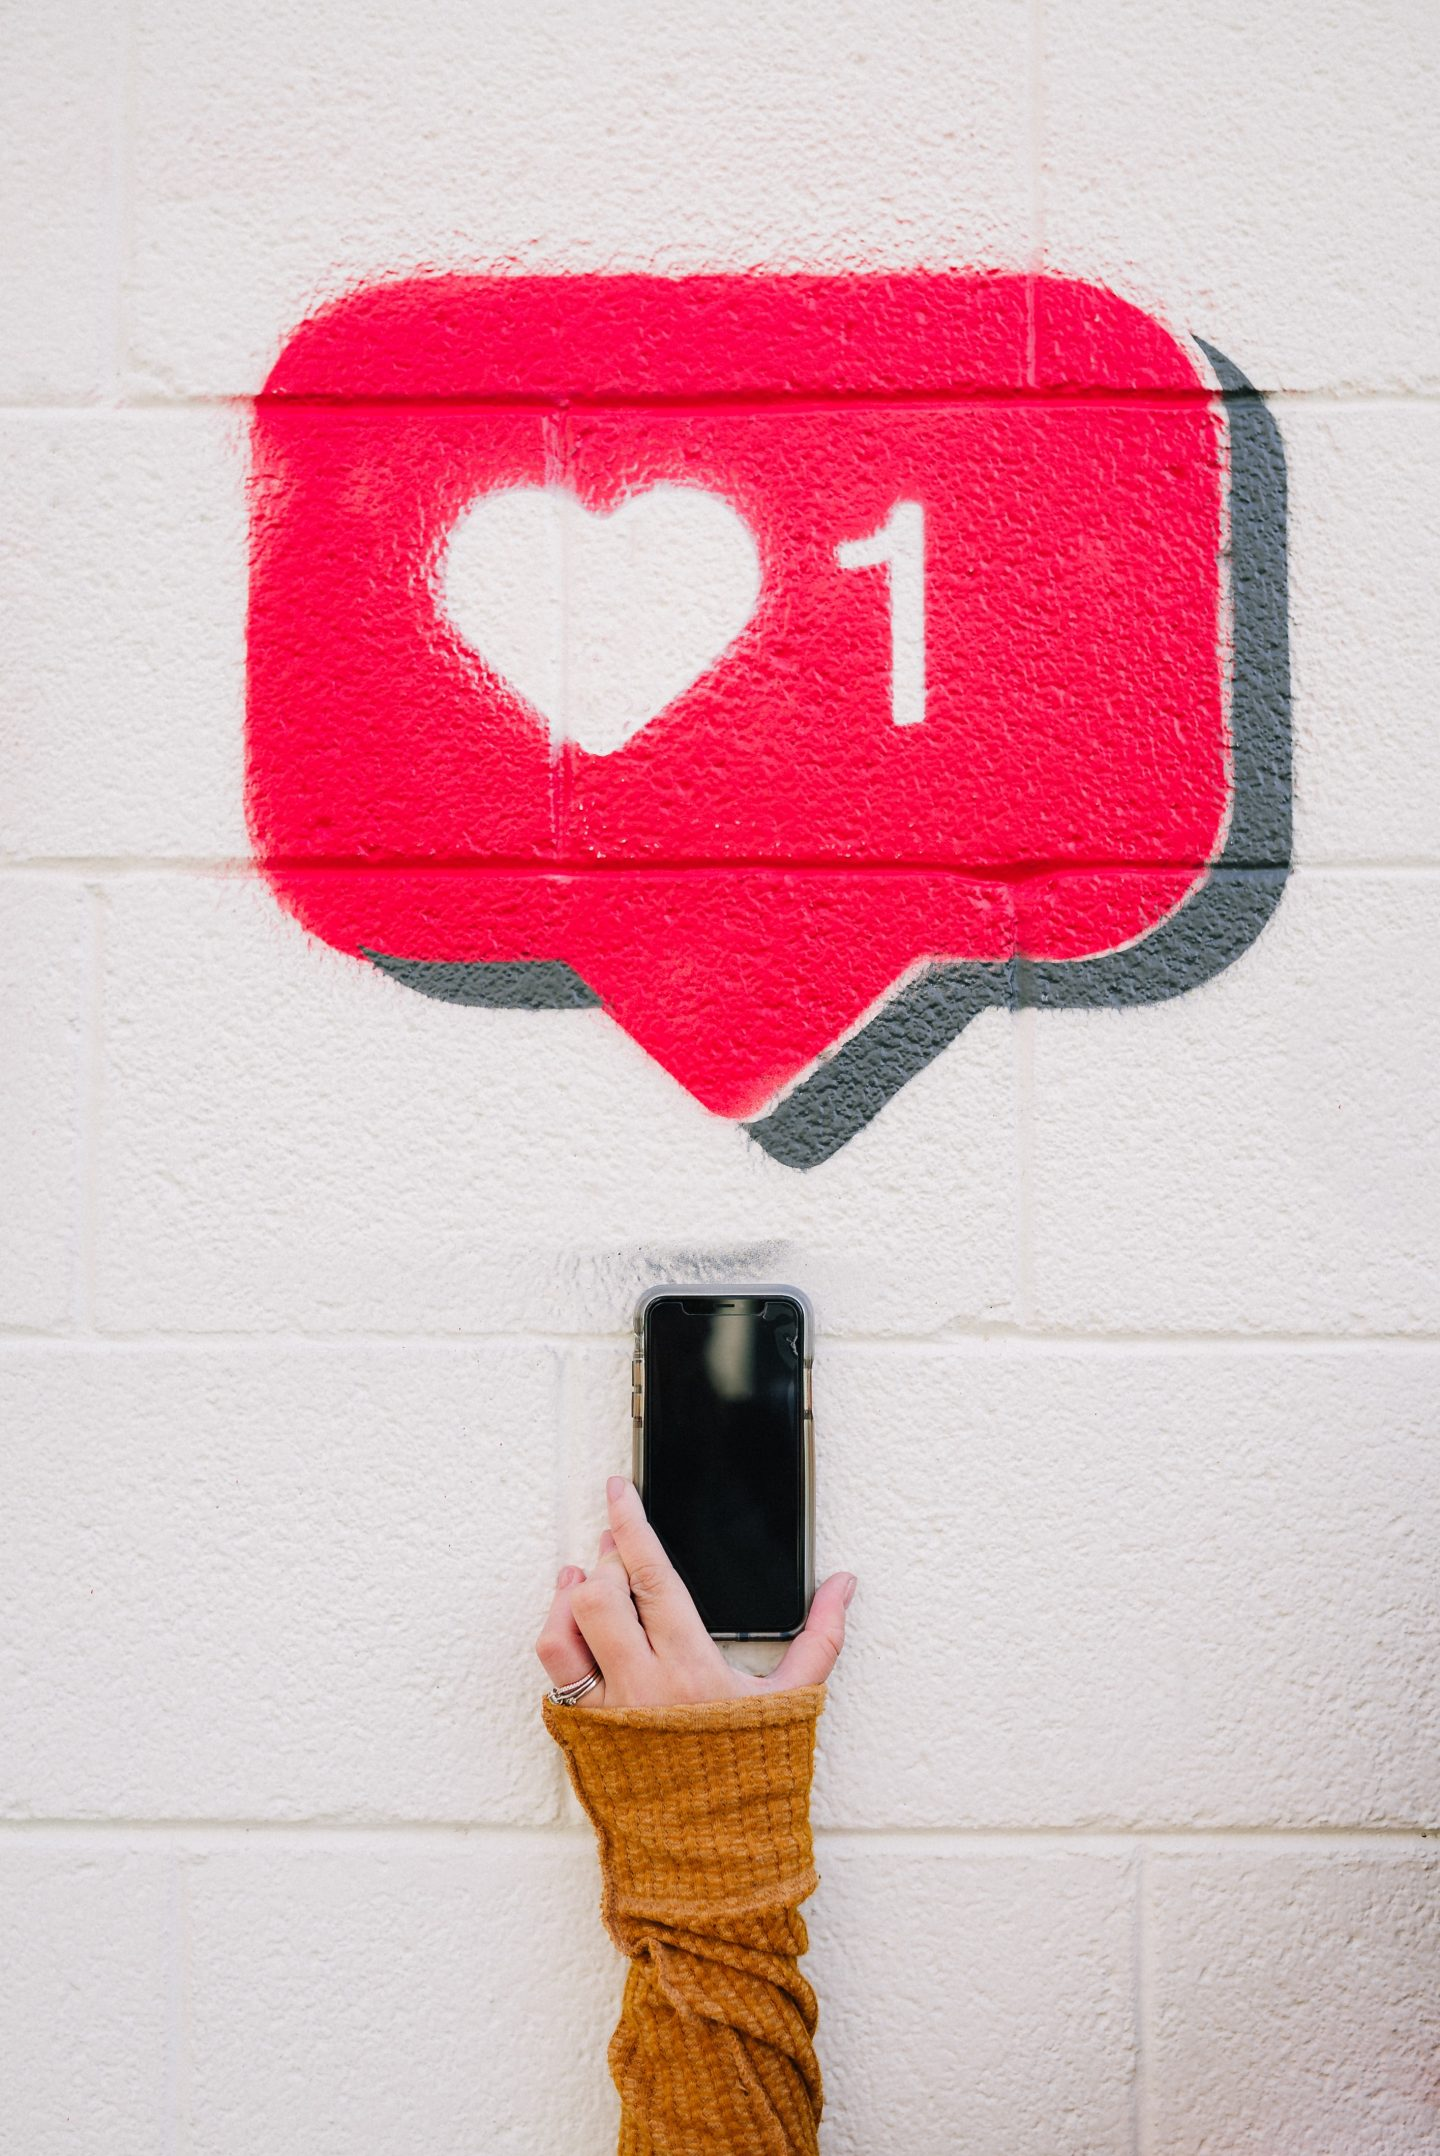 5 reasons why you need a digital detox | hayleyxmartin